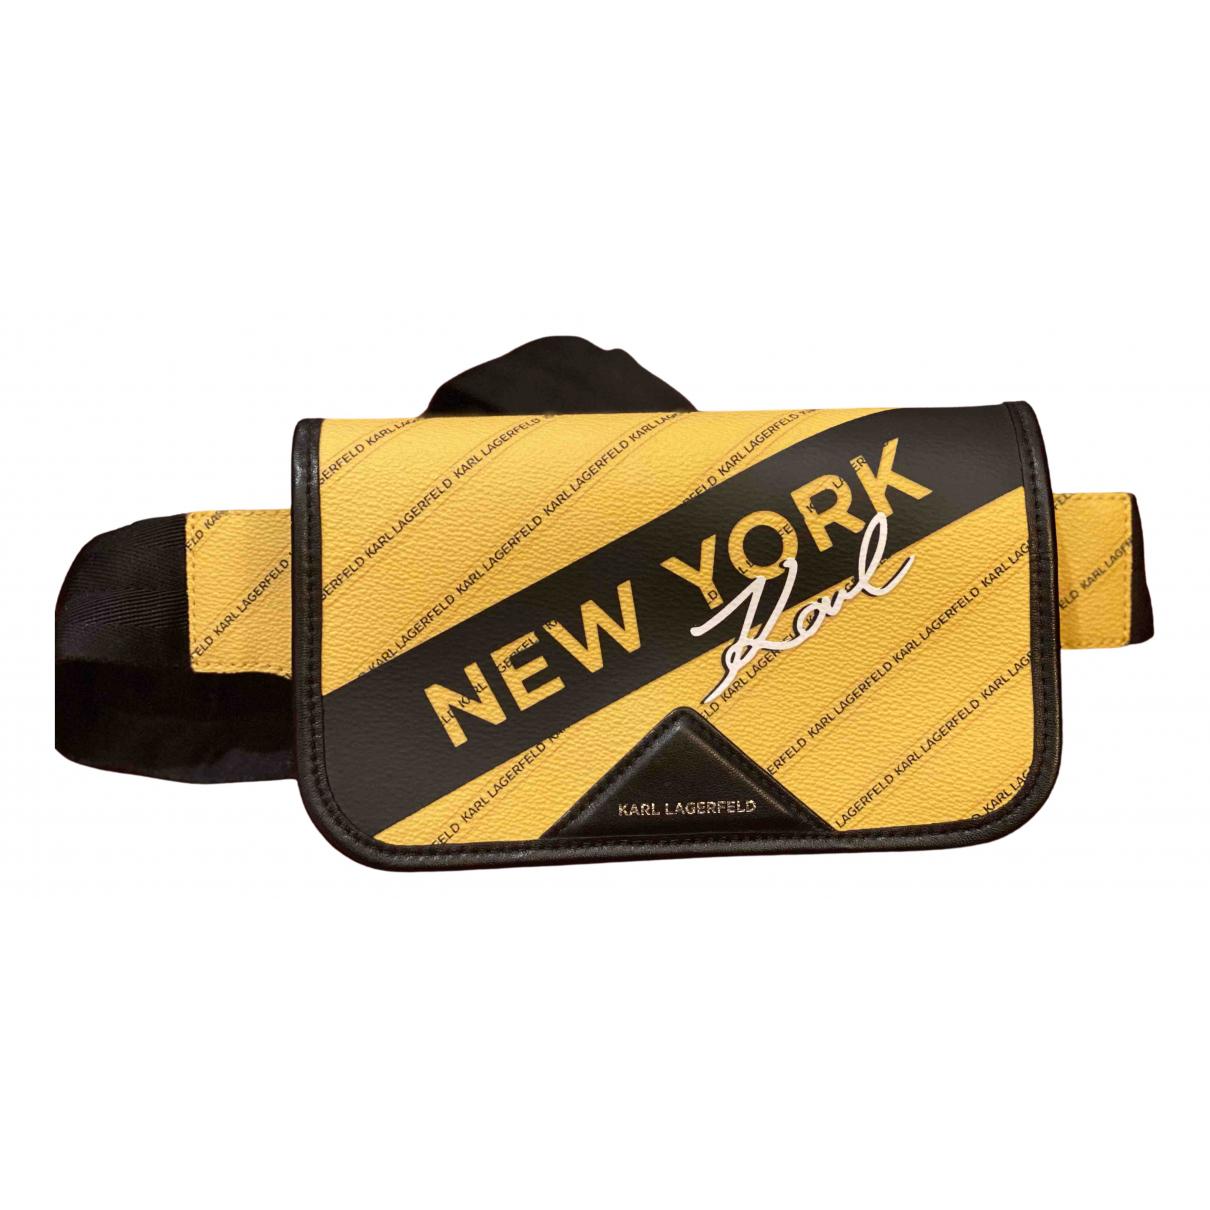 Karl Lagerfeld N Yellow Pony-style calfskin Clutch bag for Women N